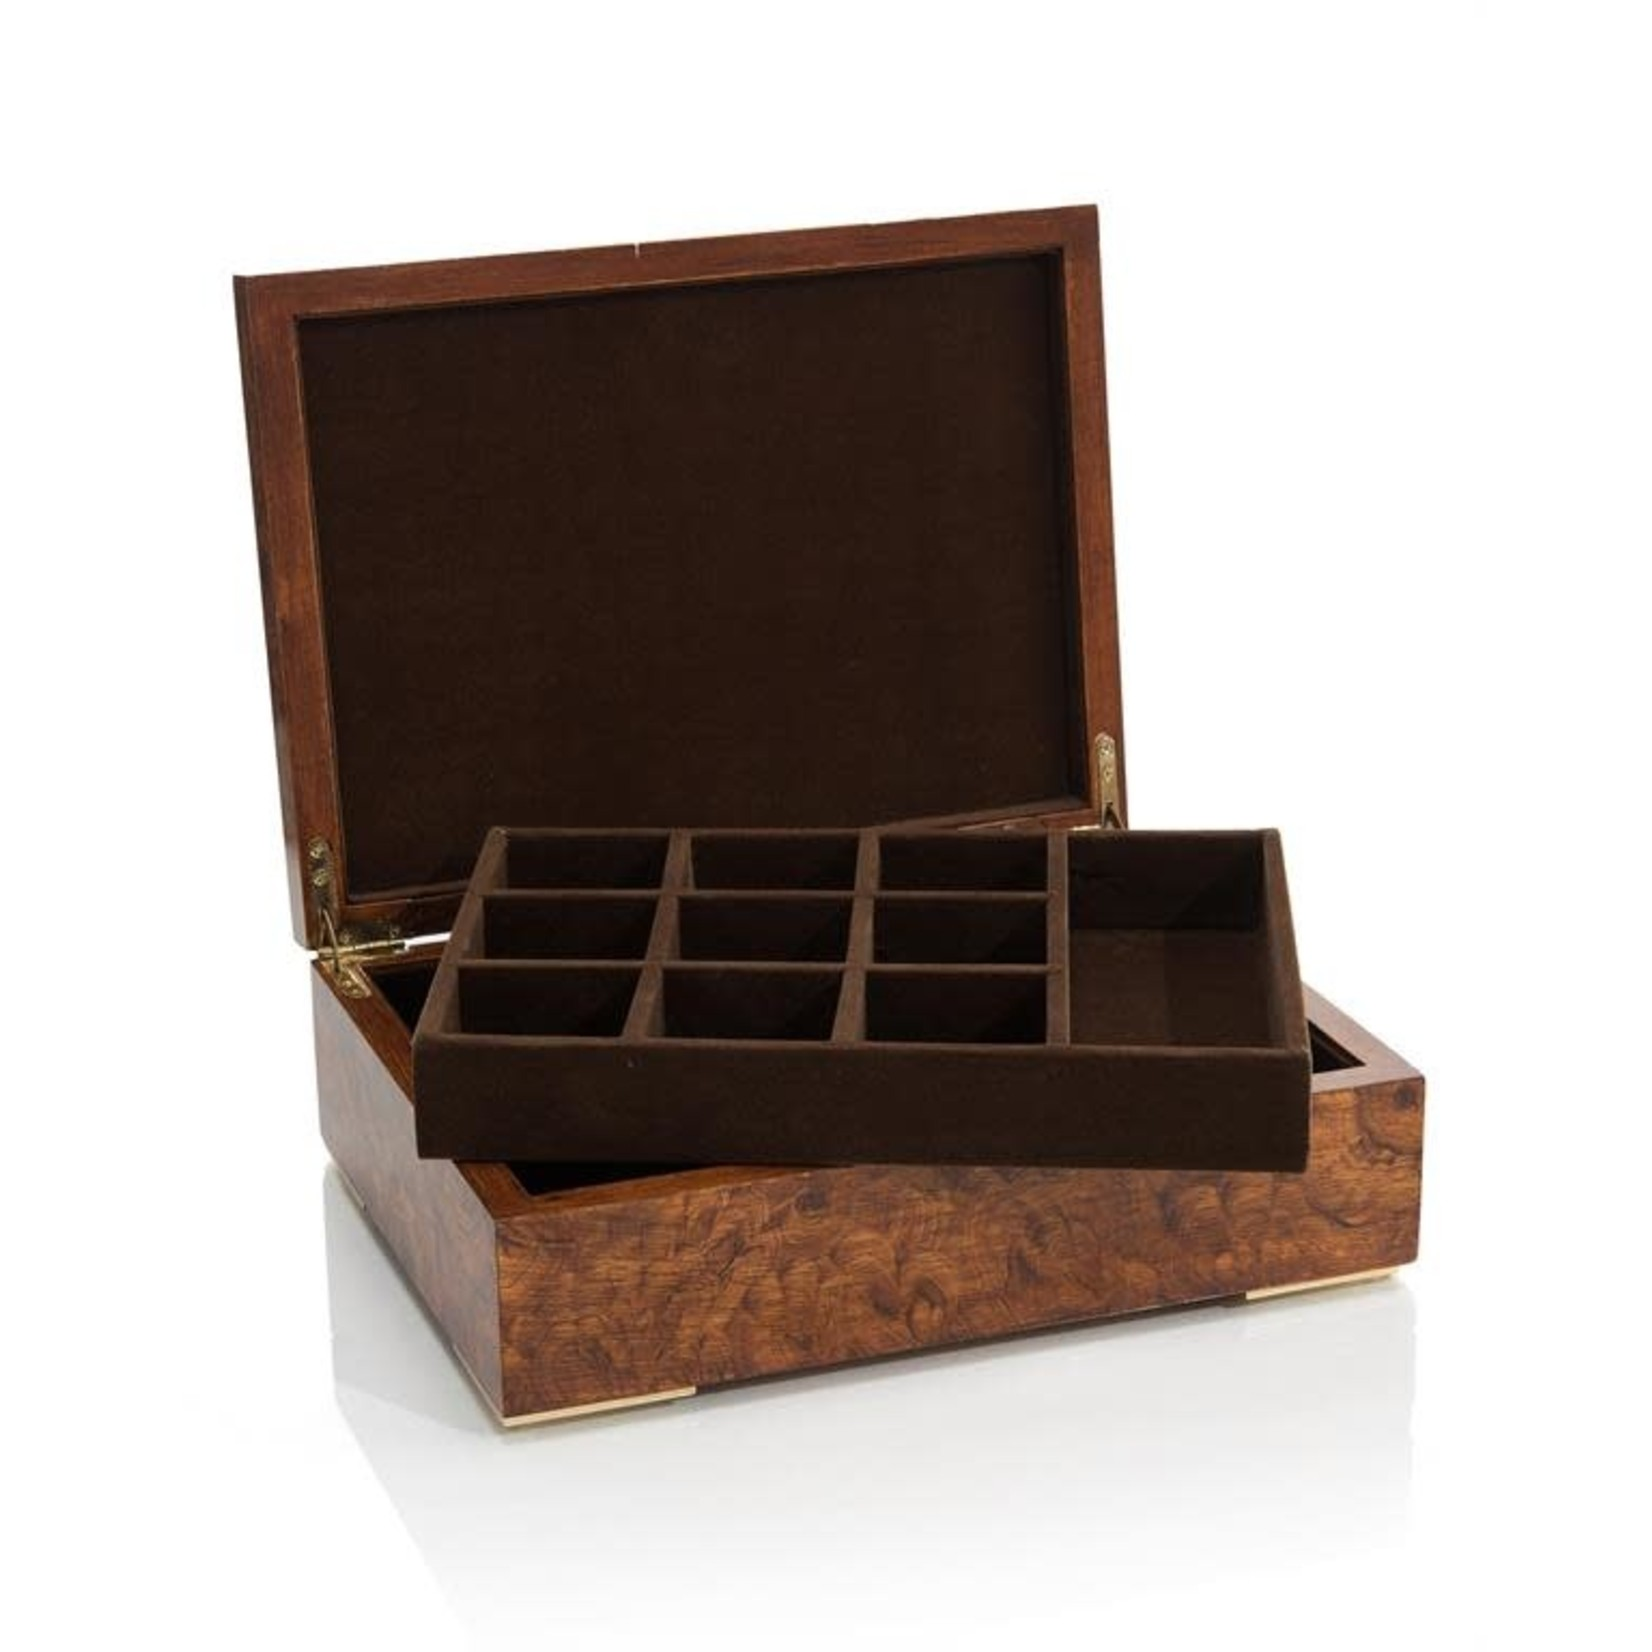 John Richard Faux Burled Box with Quartz Points